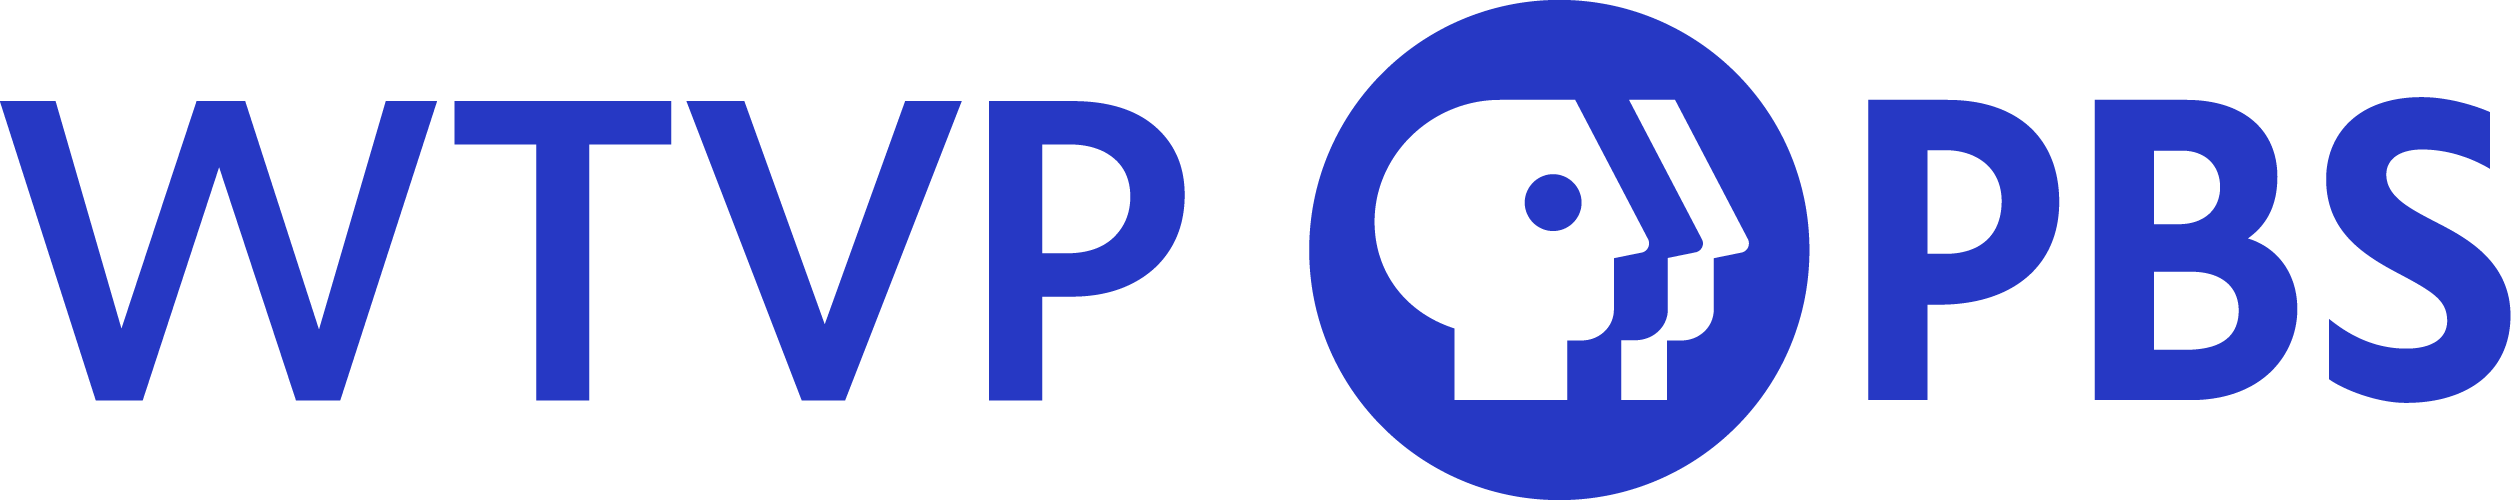 WTVP, Public Media for Central Illinois